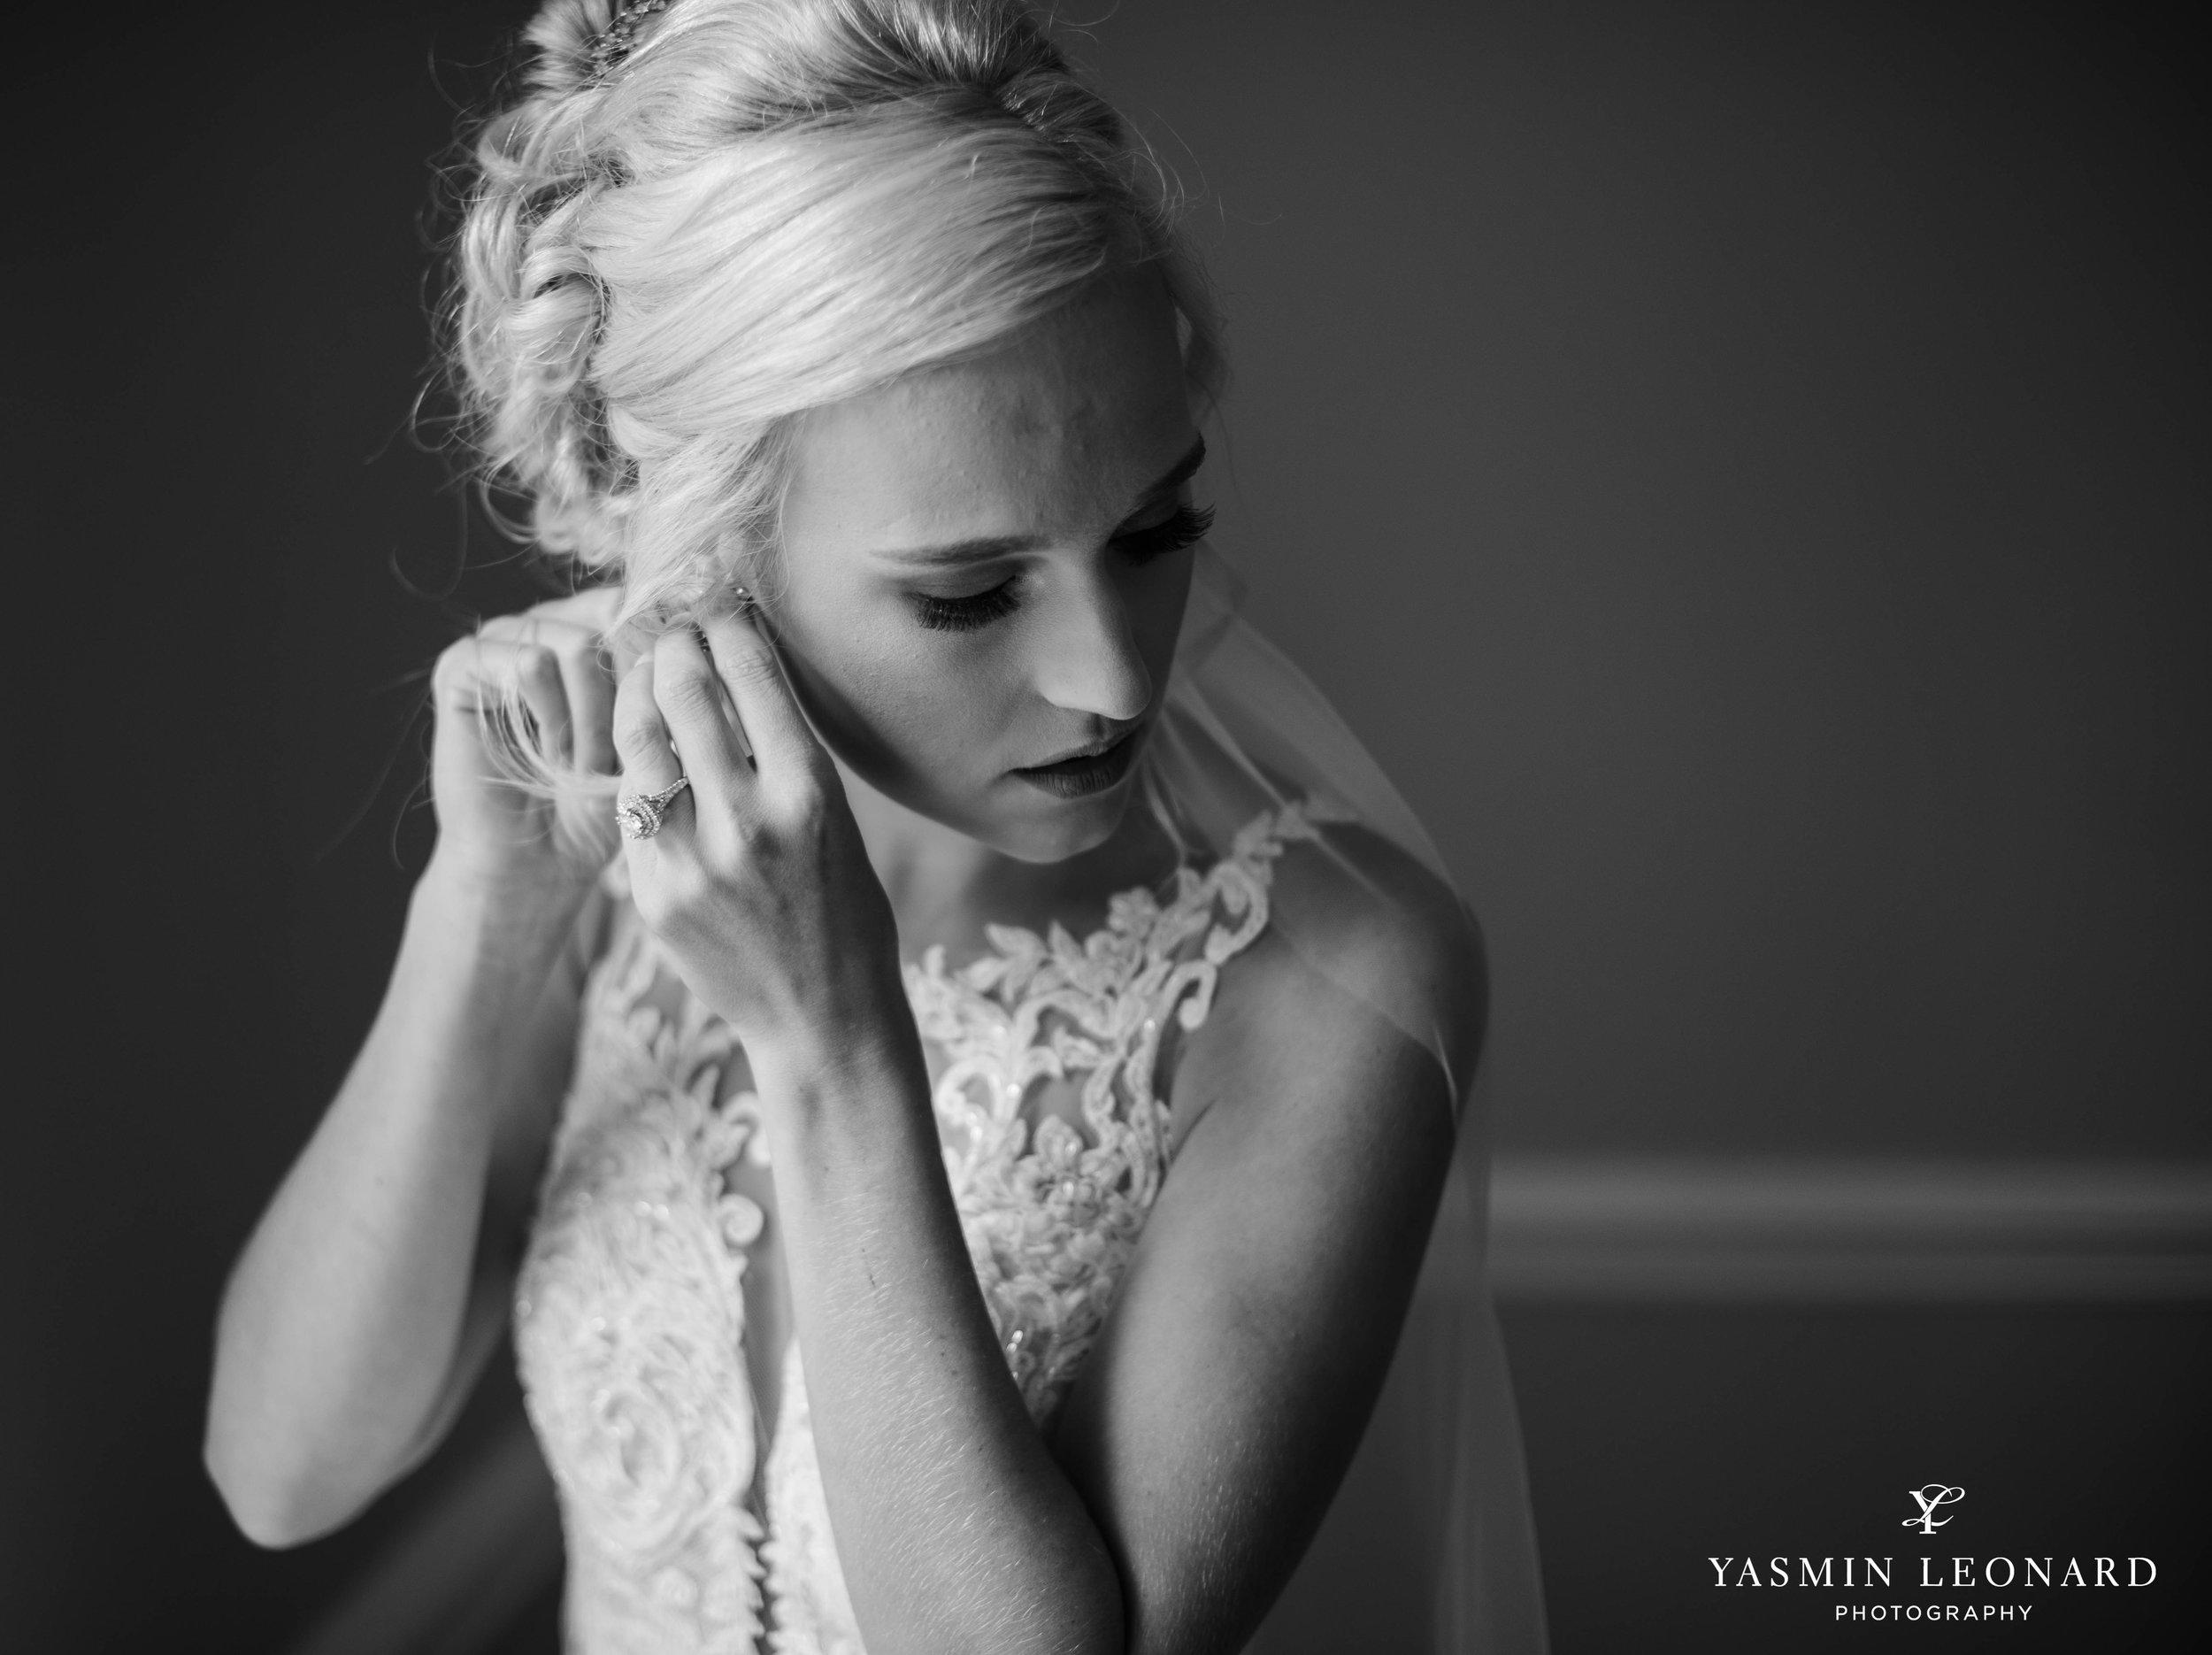 Separk Mansion - NC Weddings - Gastonia Wedding - NC Wedding Venues - Pink and Blue Wedding Ideas - Pink Bridesmaid Dresses - Yasmin Leonard Photography-7.jpg